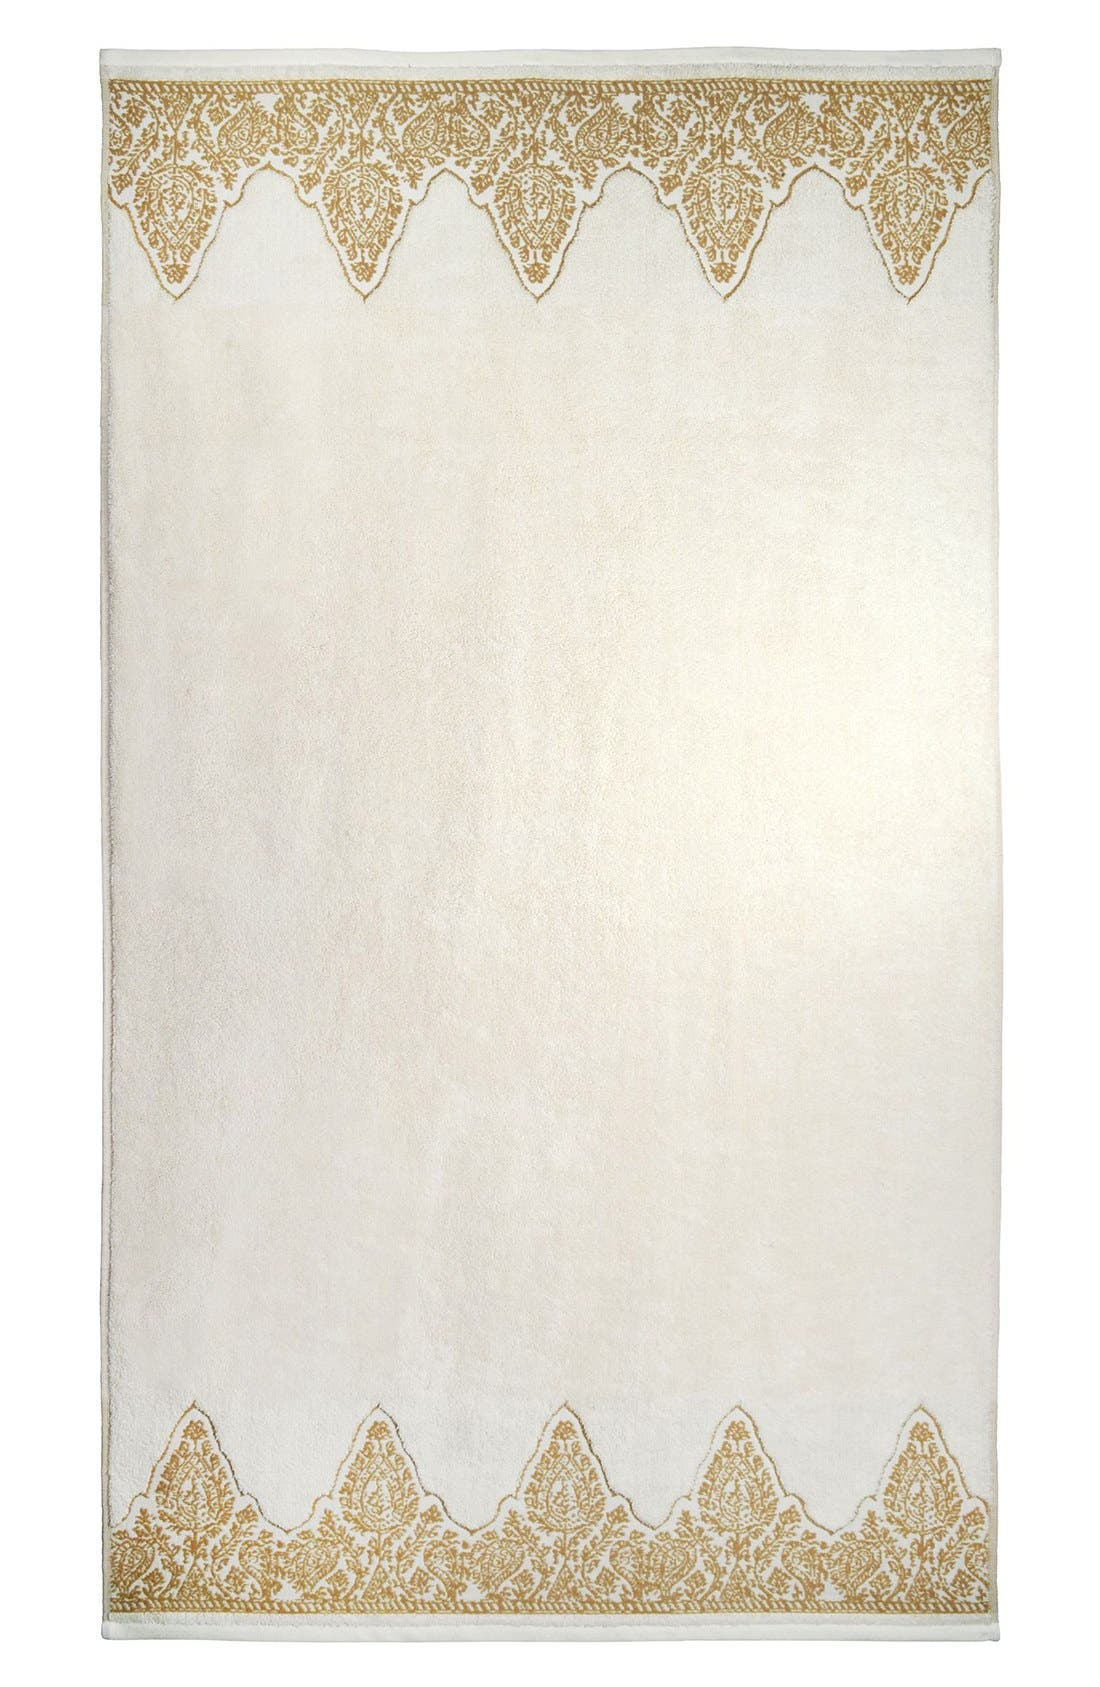 Alternate Image 1 Selected - John Robshaw 'Nadir' Bath Towel